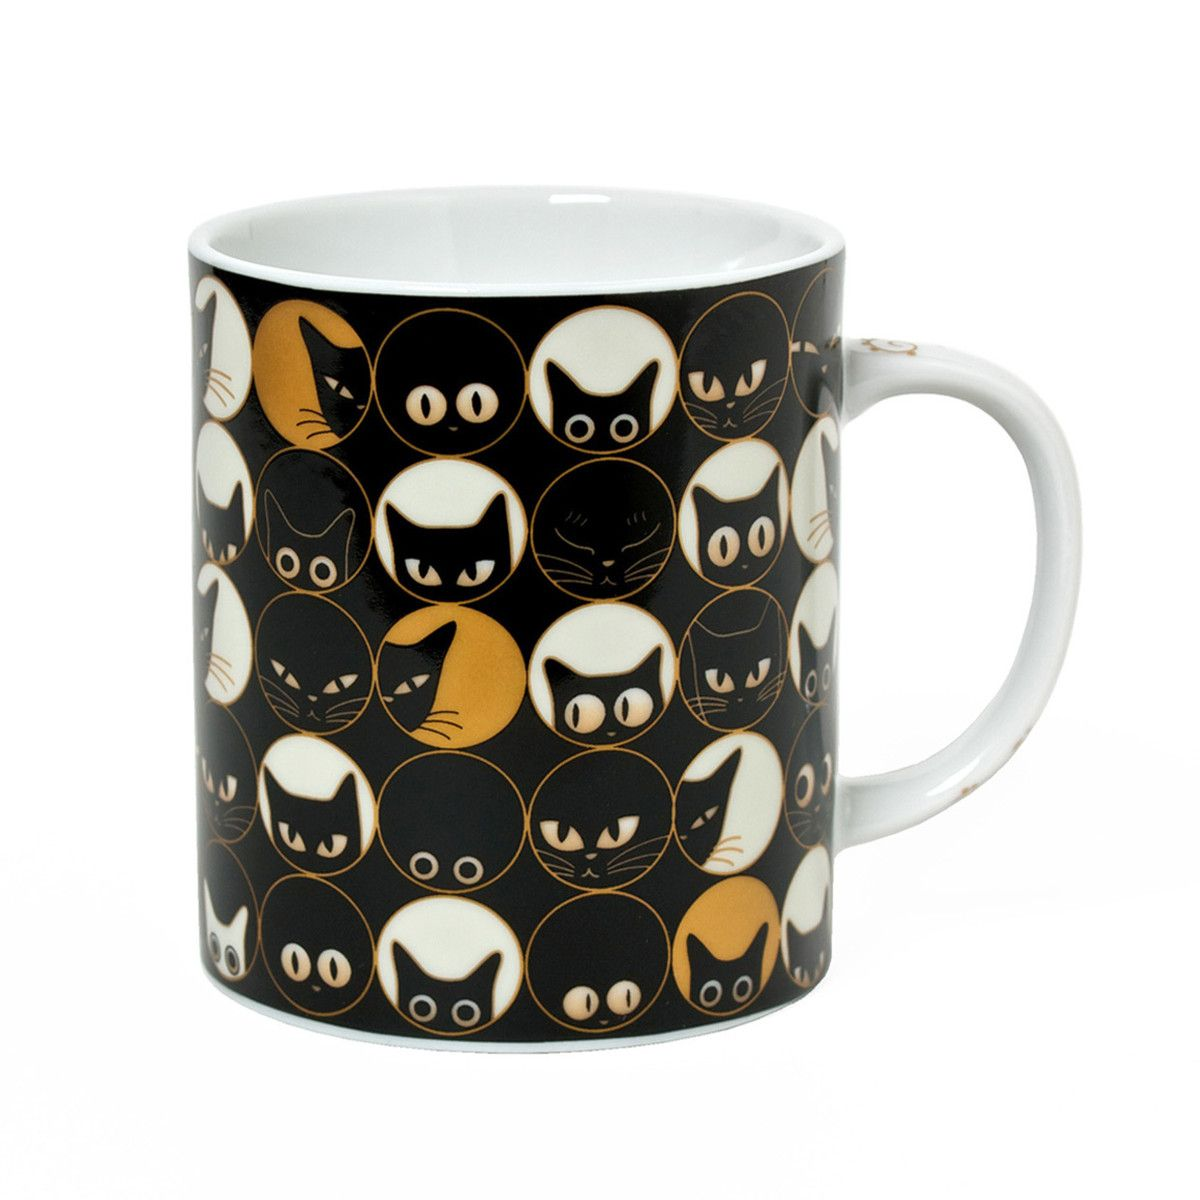 Cat Eye Mug - for the cat lover in your family.